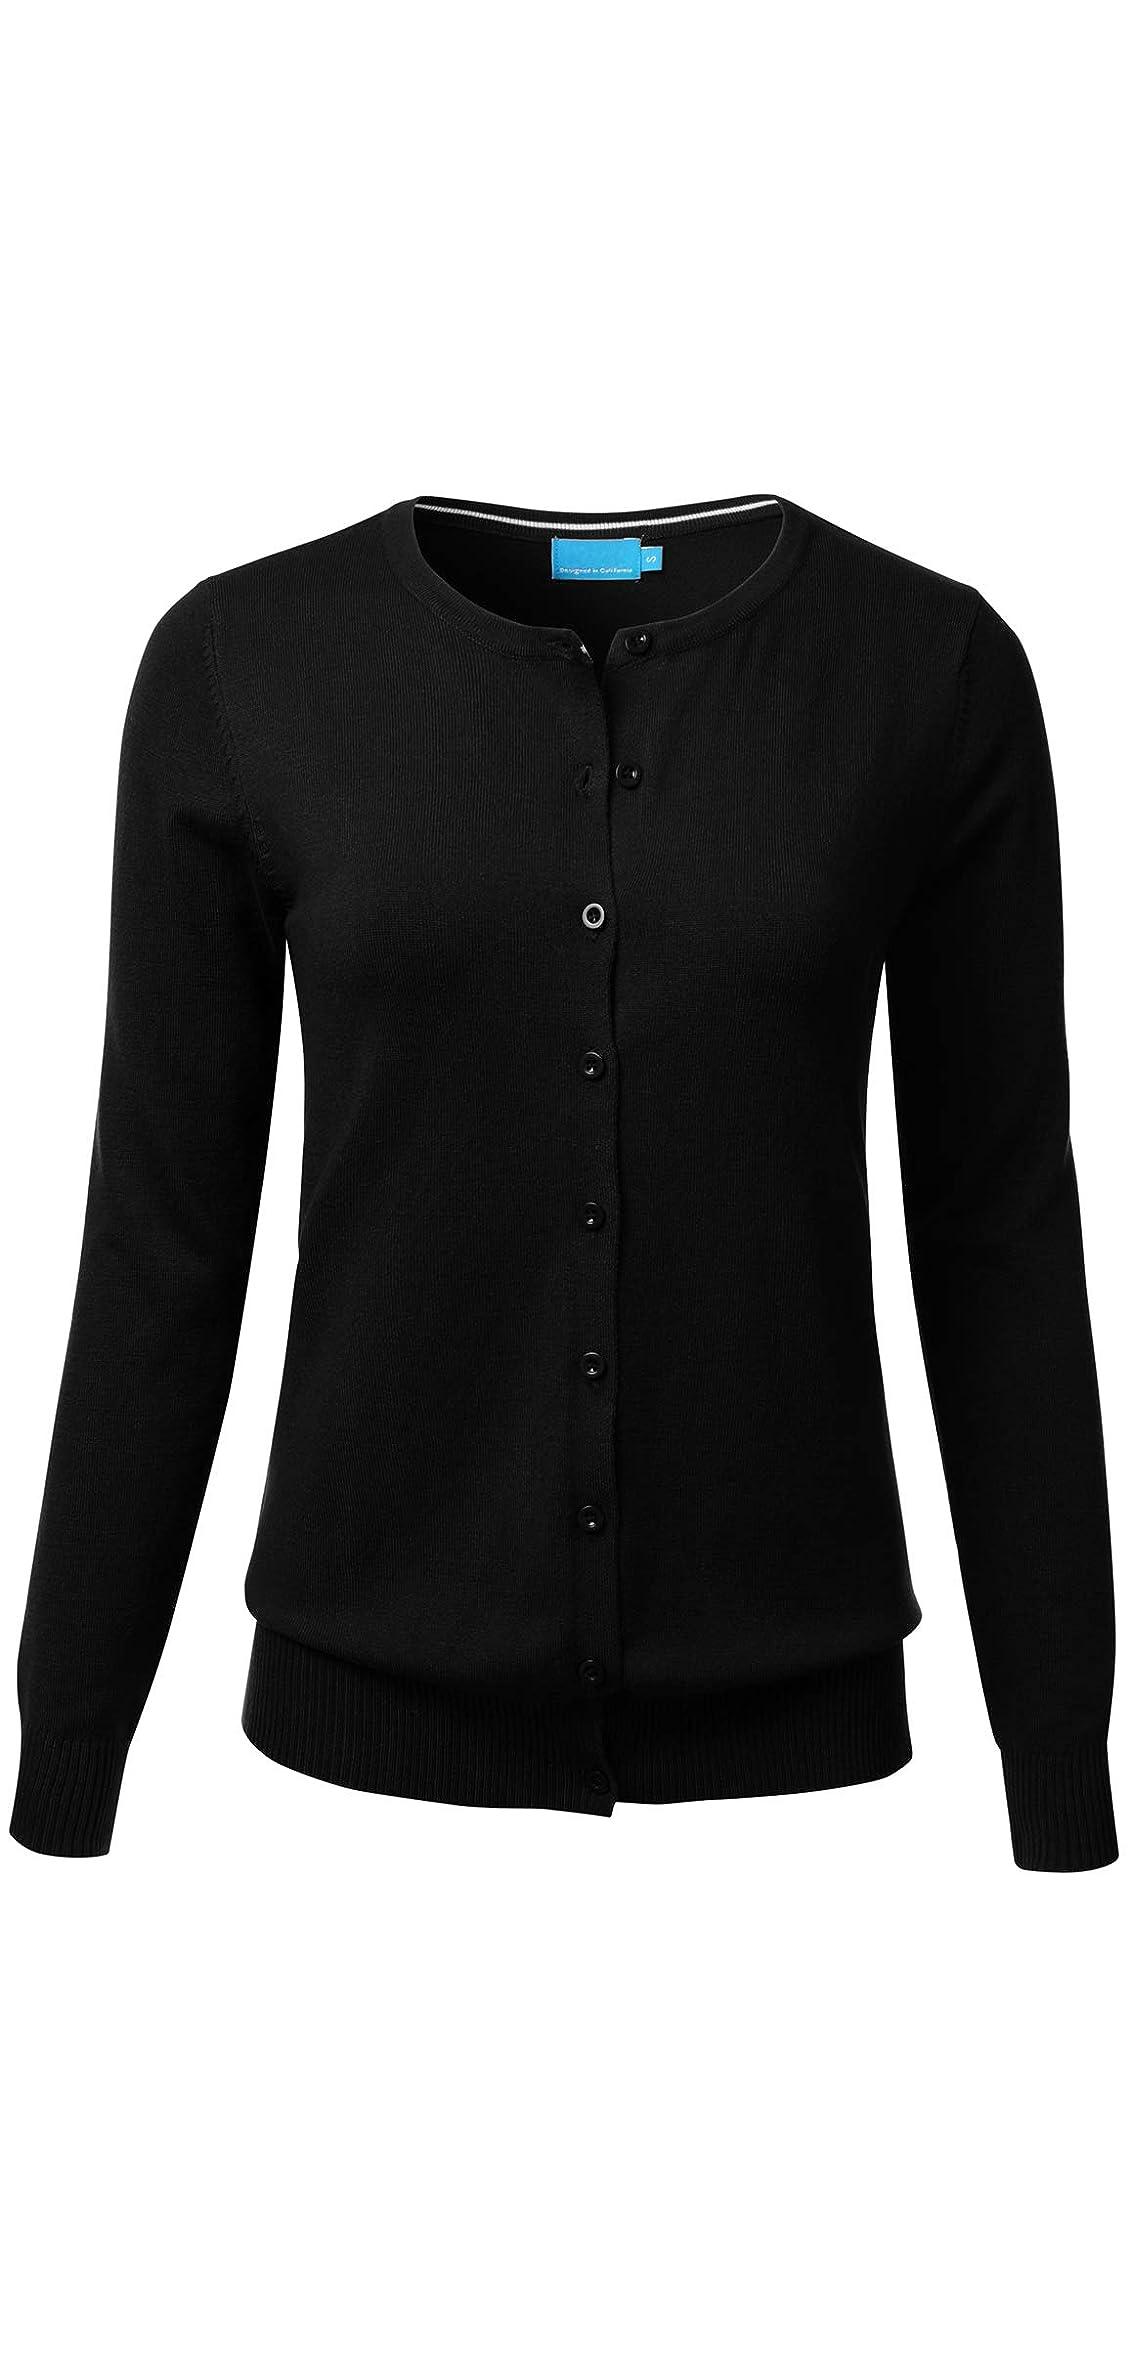 Women's Button Down Crew Neck Long Sleeve Soft Knit